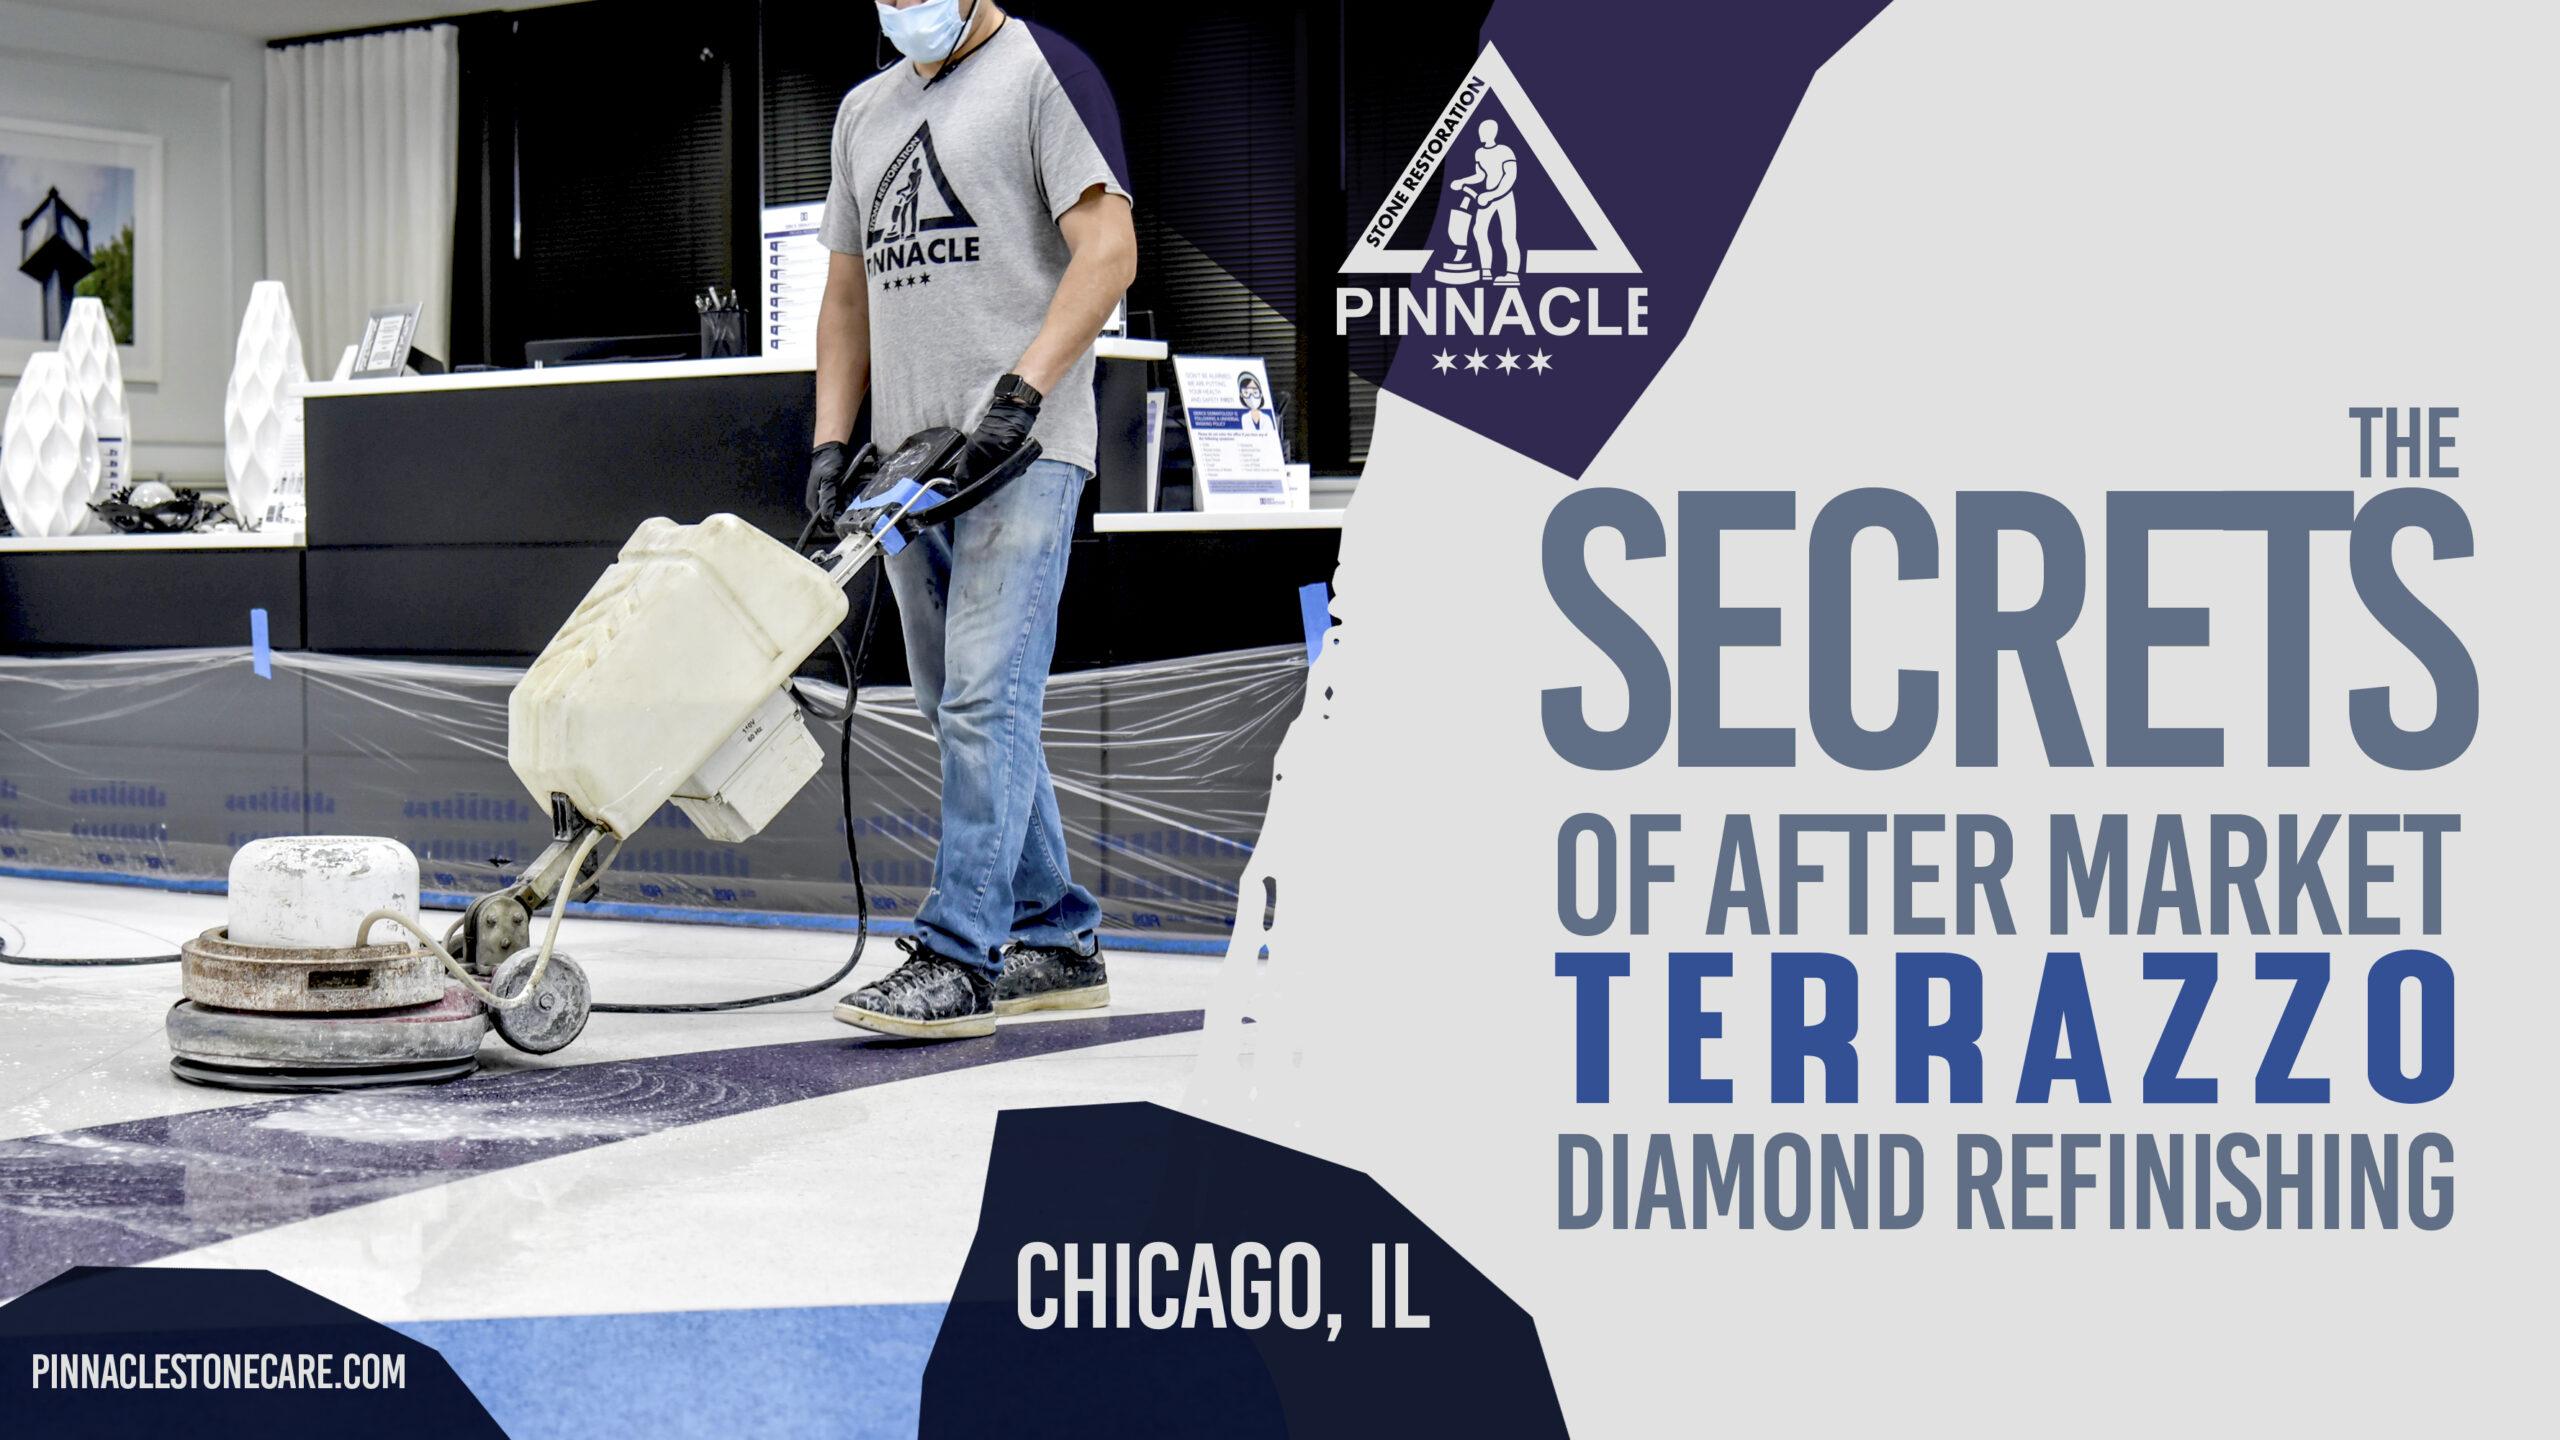 The Secrets of After Market Terrazzo Diamond Refinishing